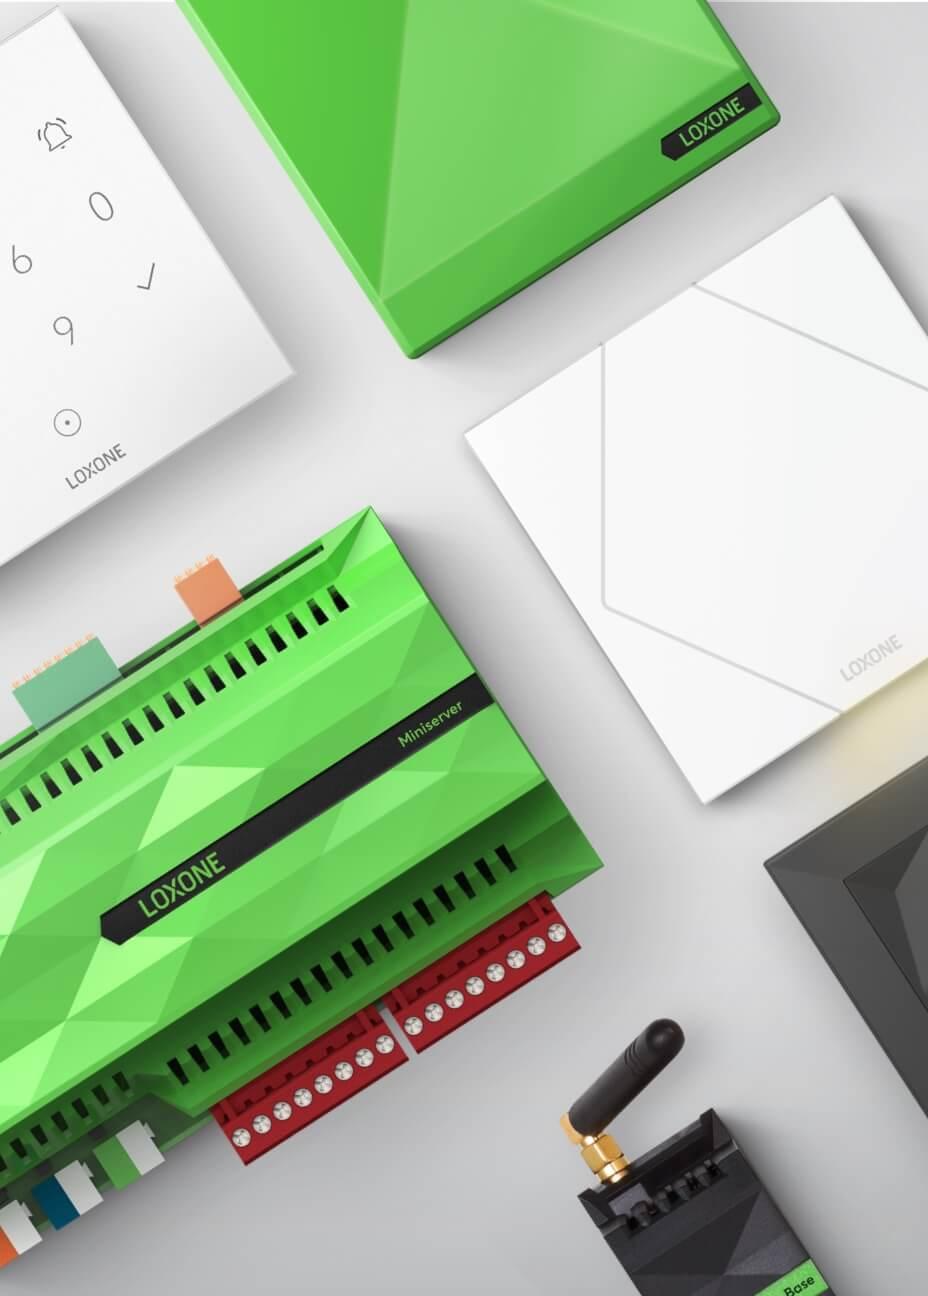 Collage Loxone Produktsortiment